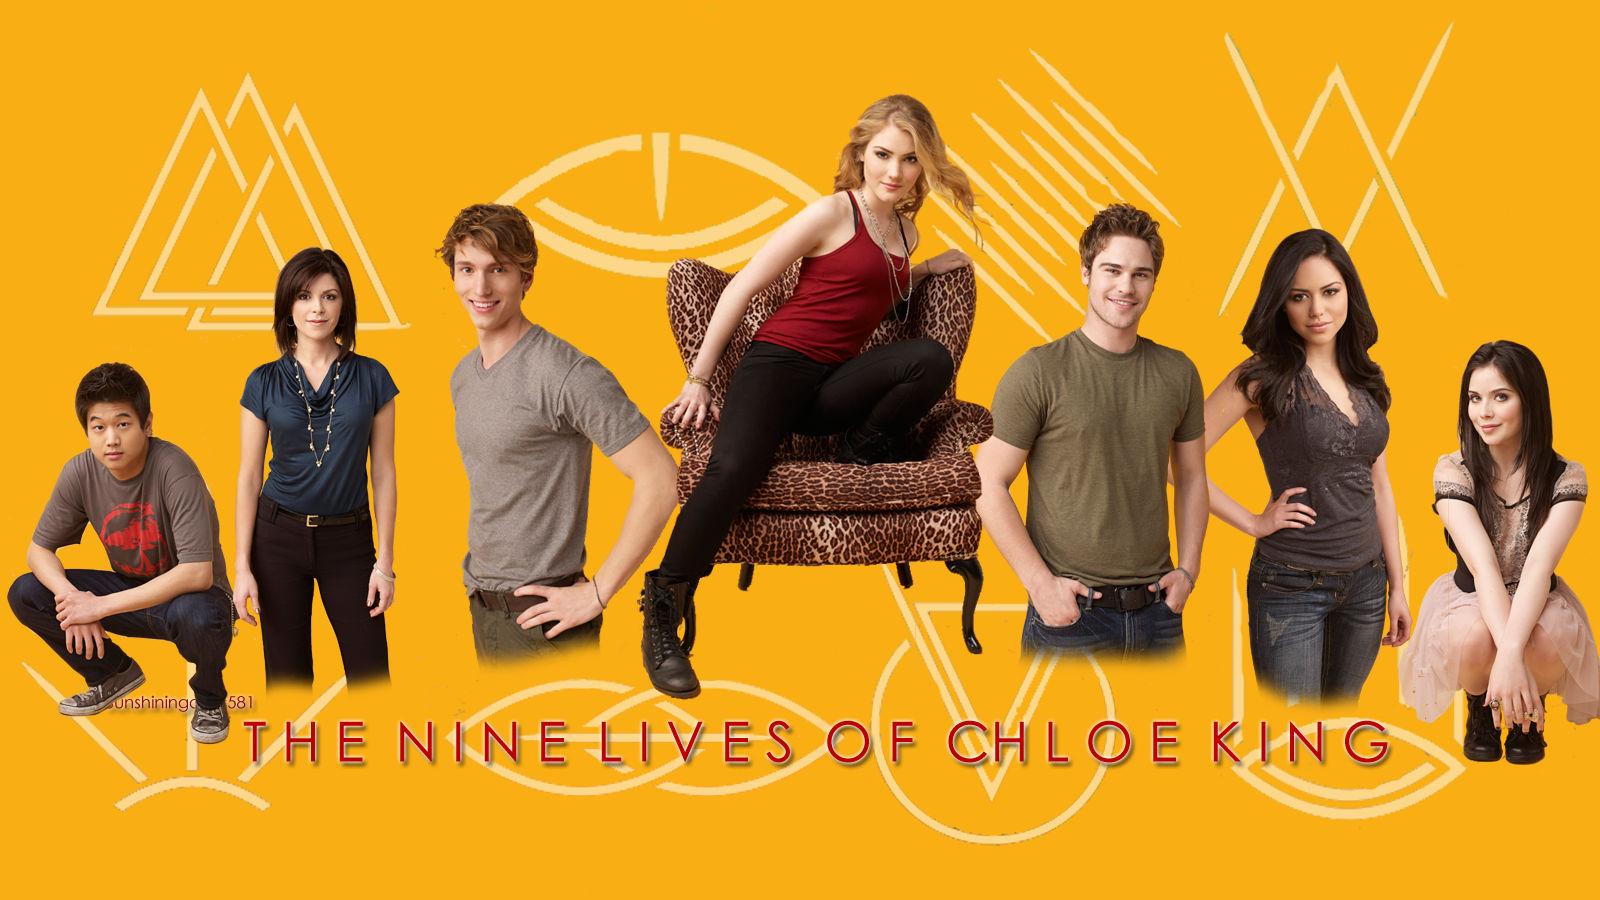 the nine lives of chloe king books free pdf